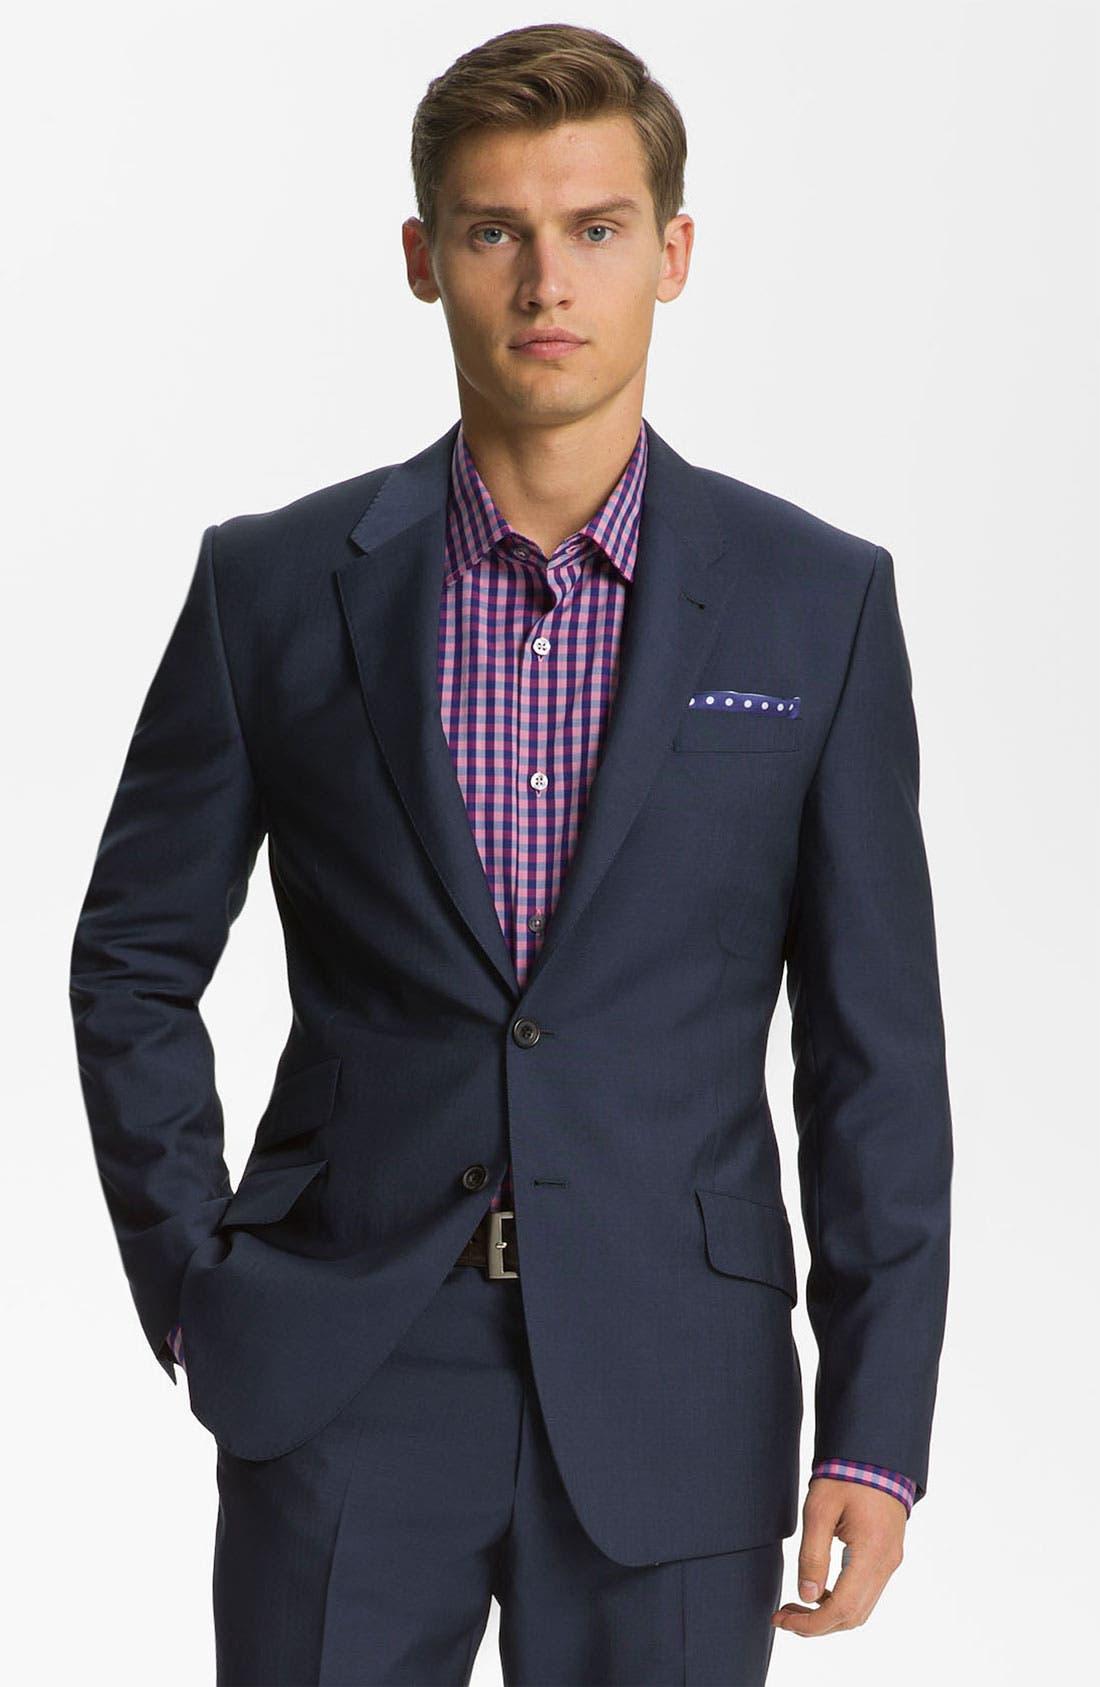 Main Image - Paul Smith London Wool & Mohair Suit